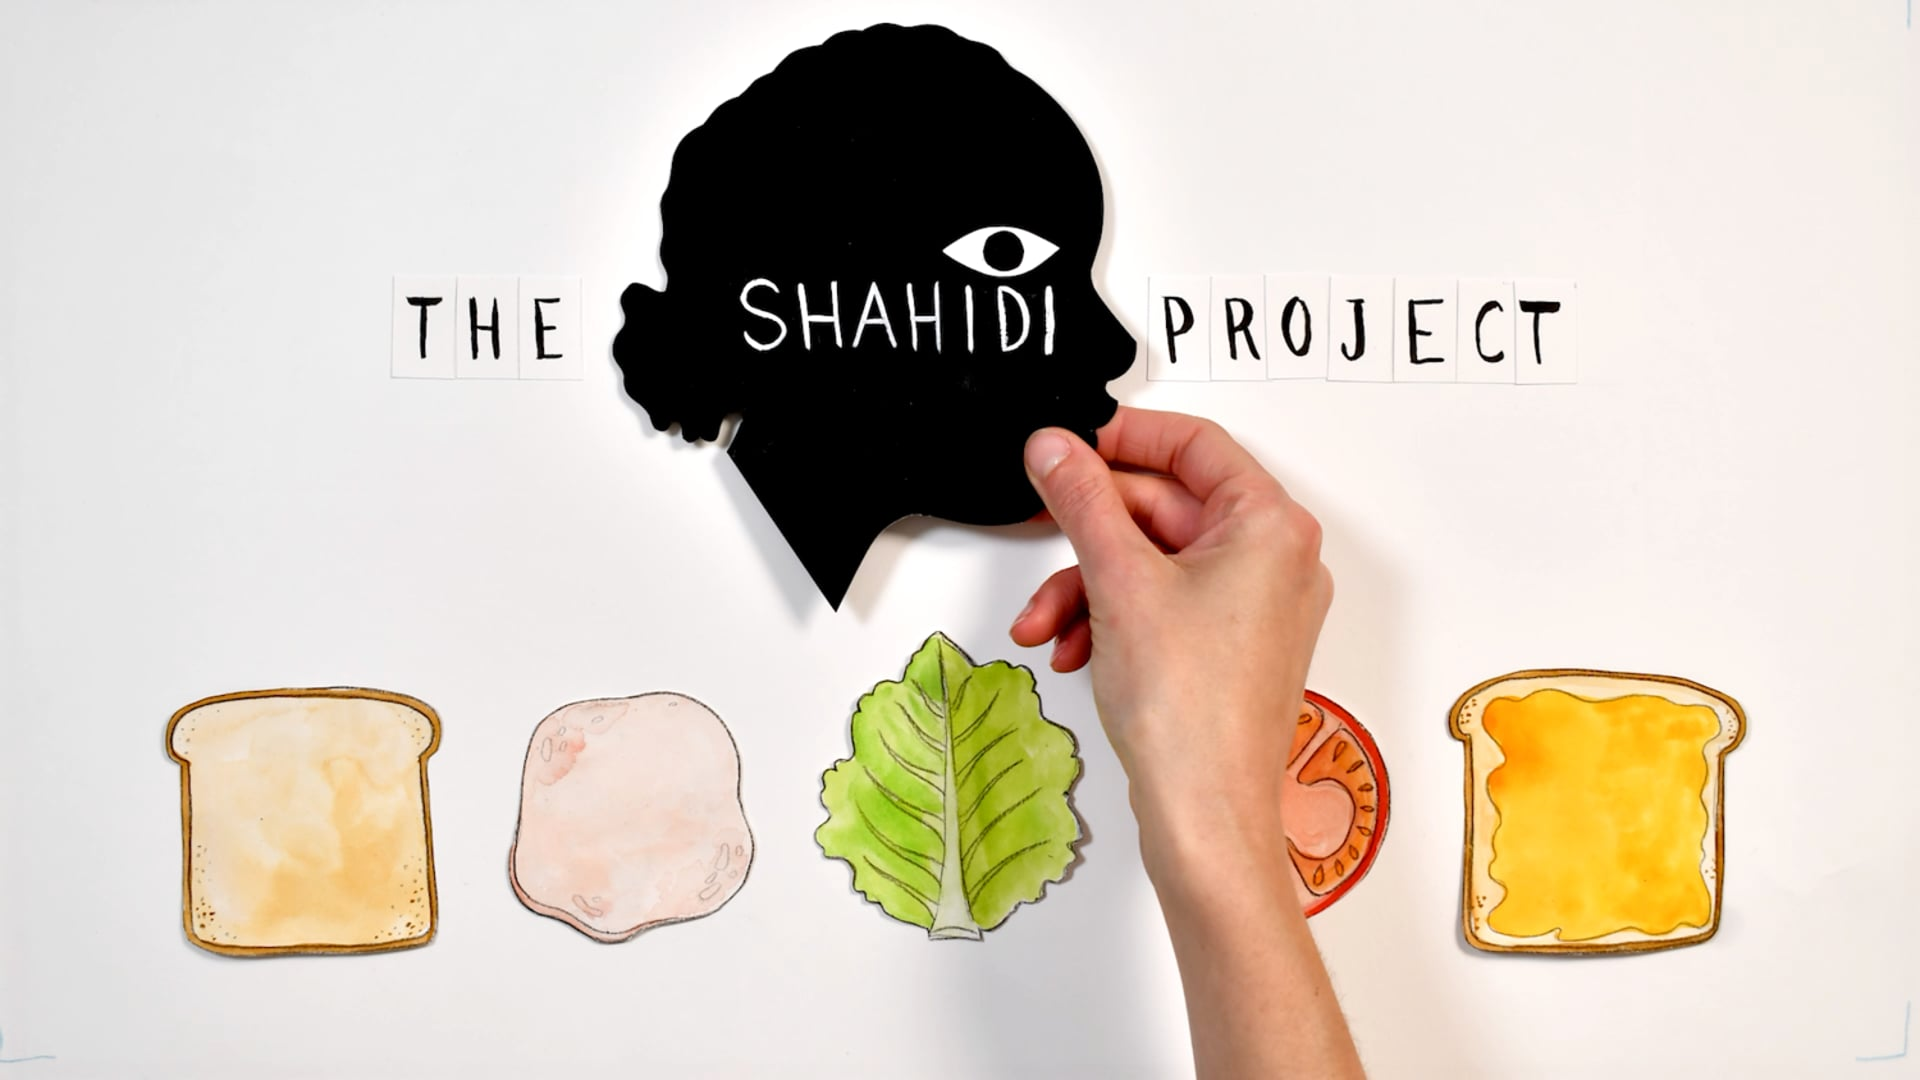 The Shahidi Project